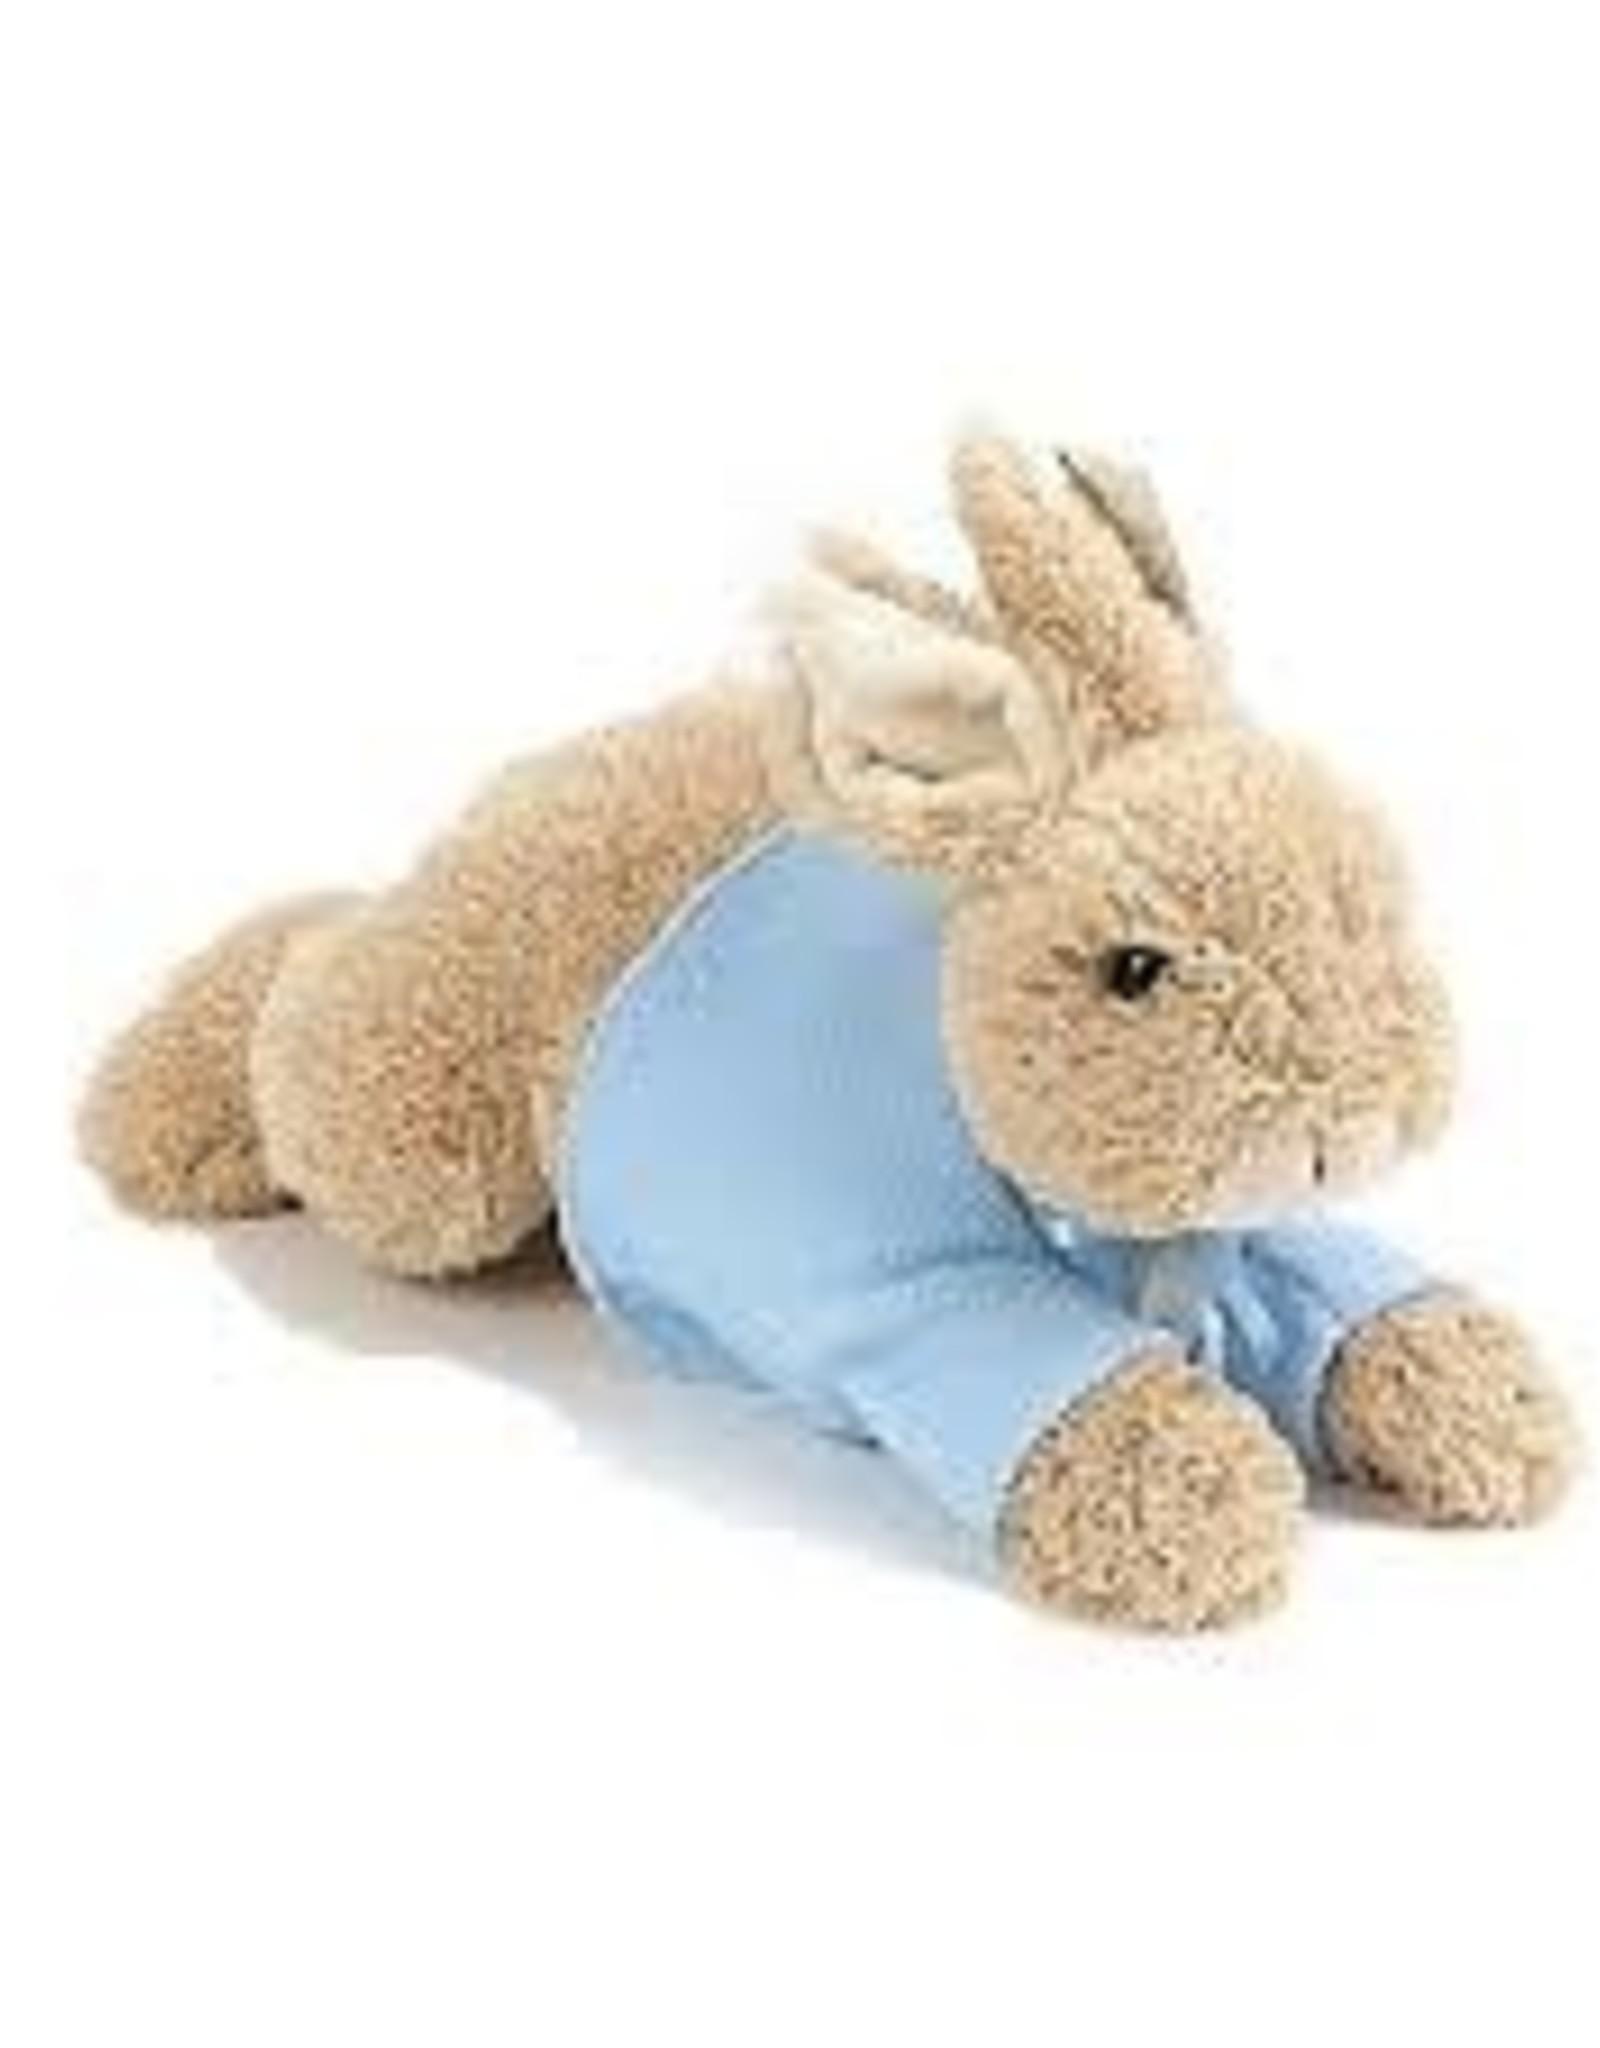 Gund Peter Rabbit laying down